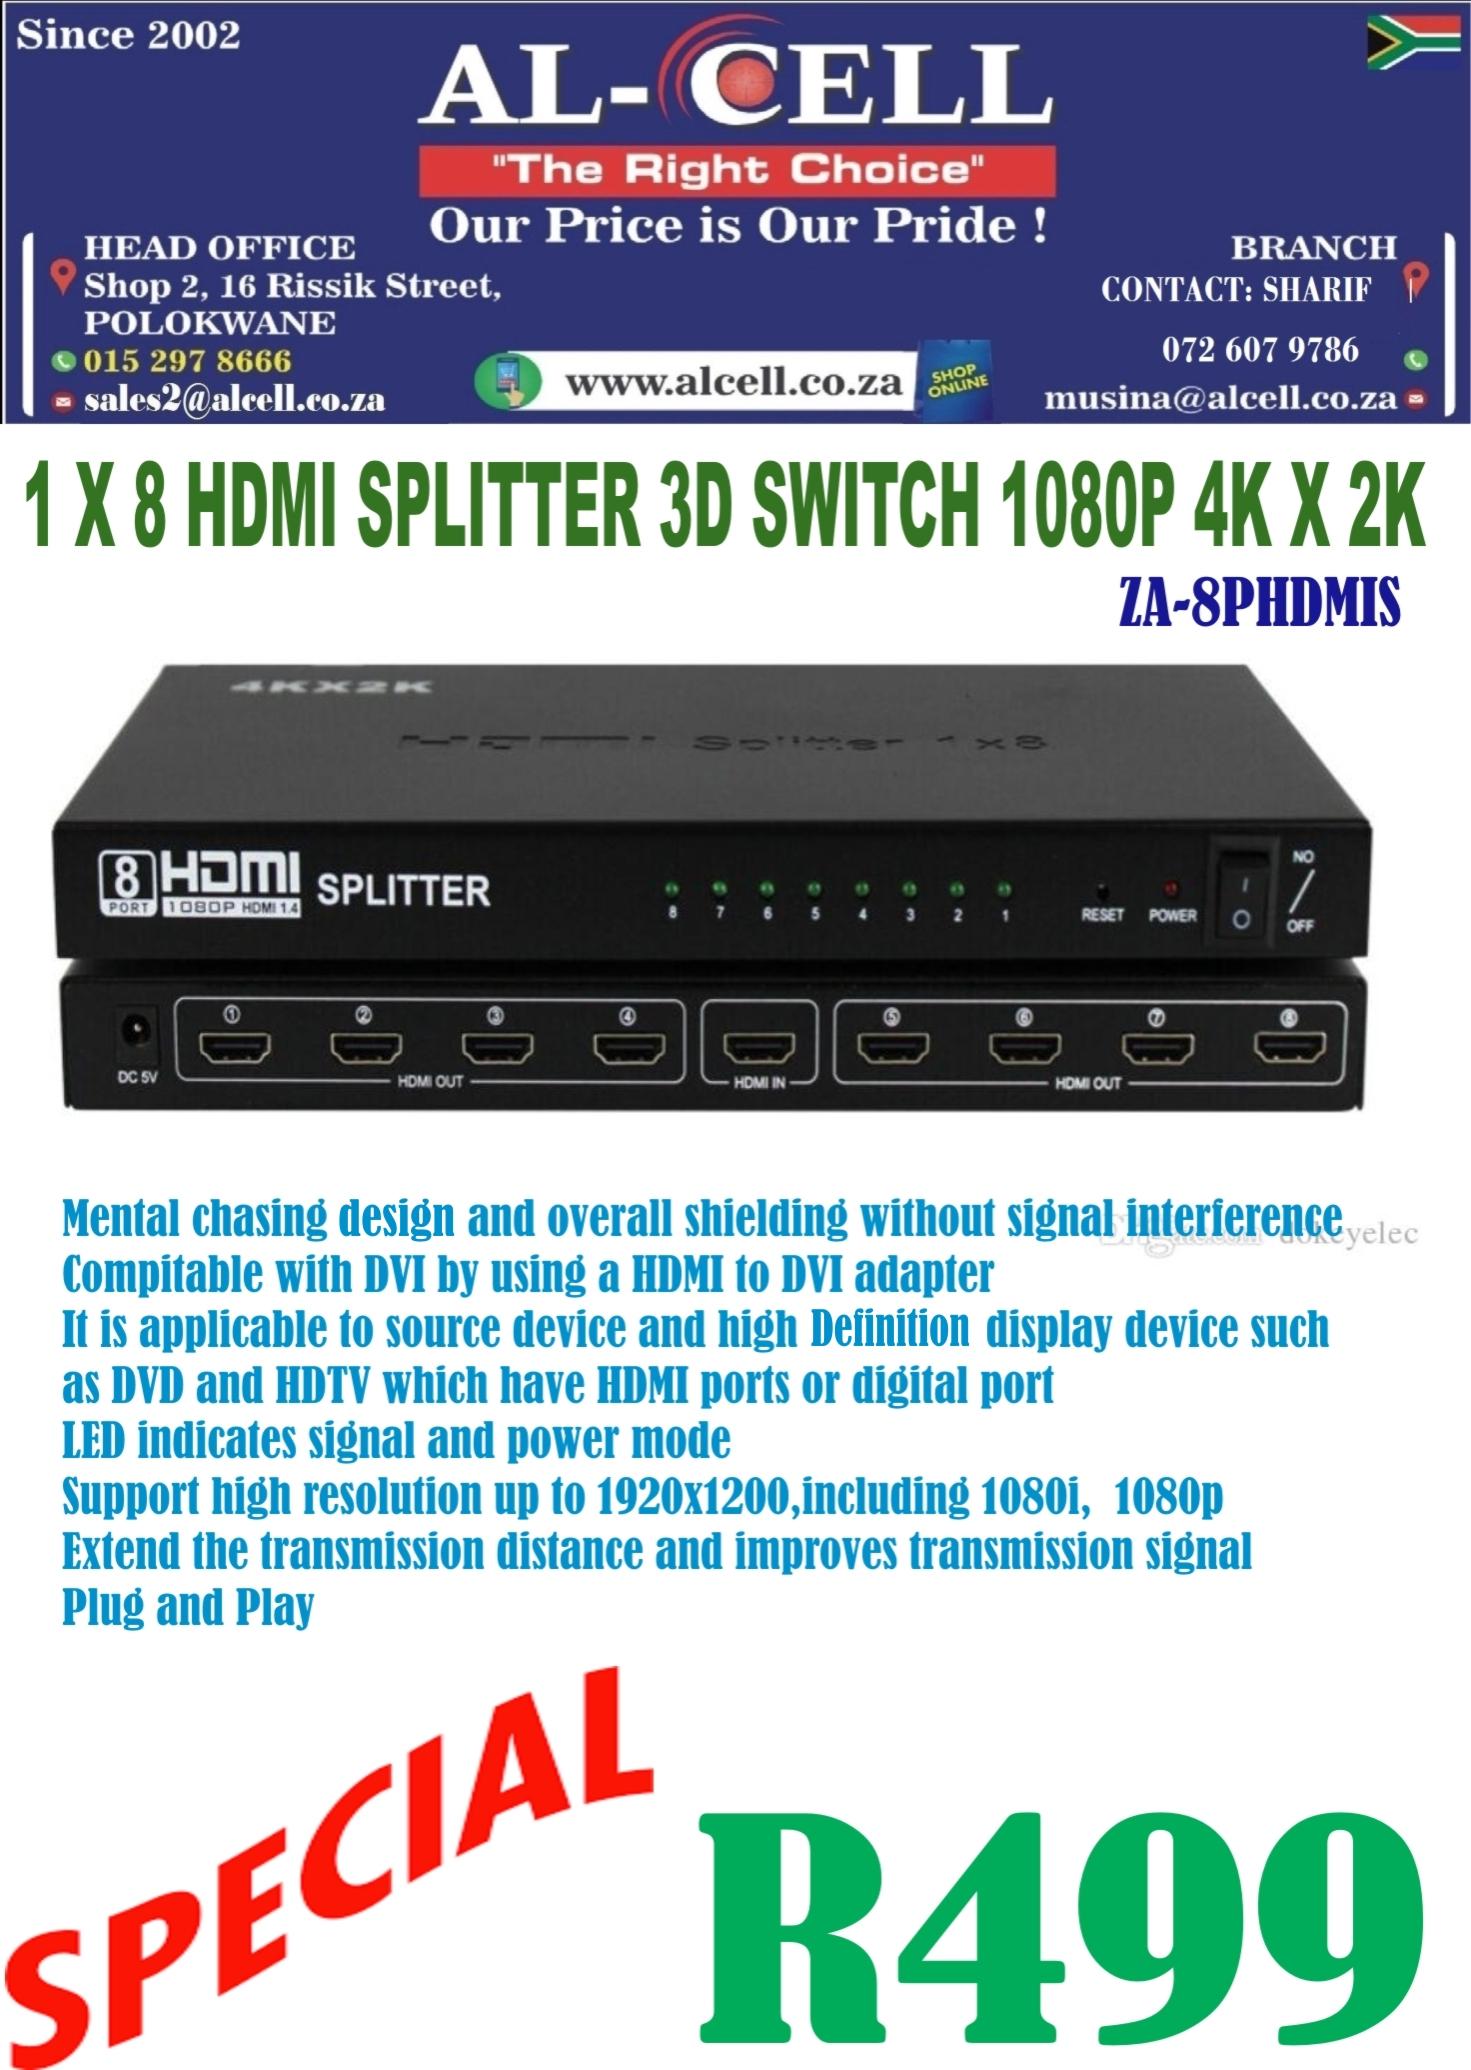 1X8 HDMI SPLITTER 3D SWITCH 1080P 4K X 2K